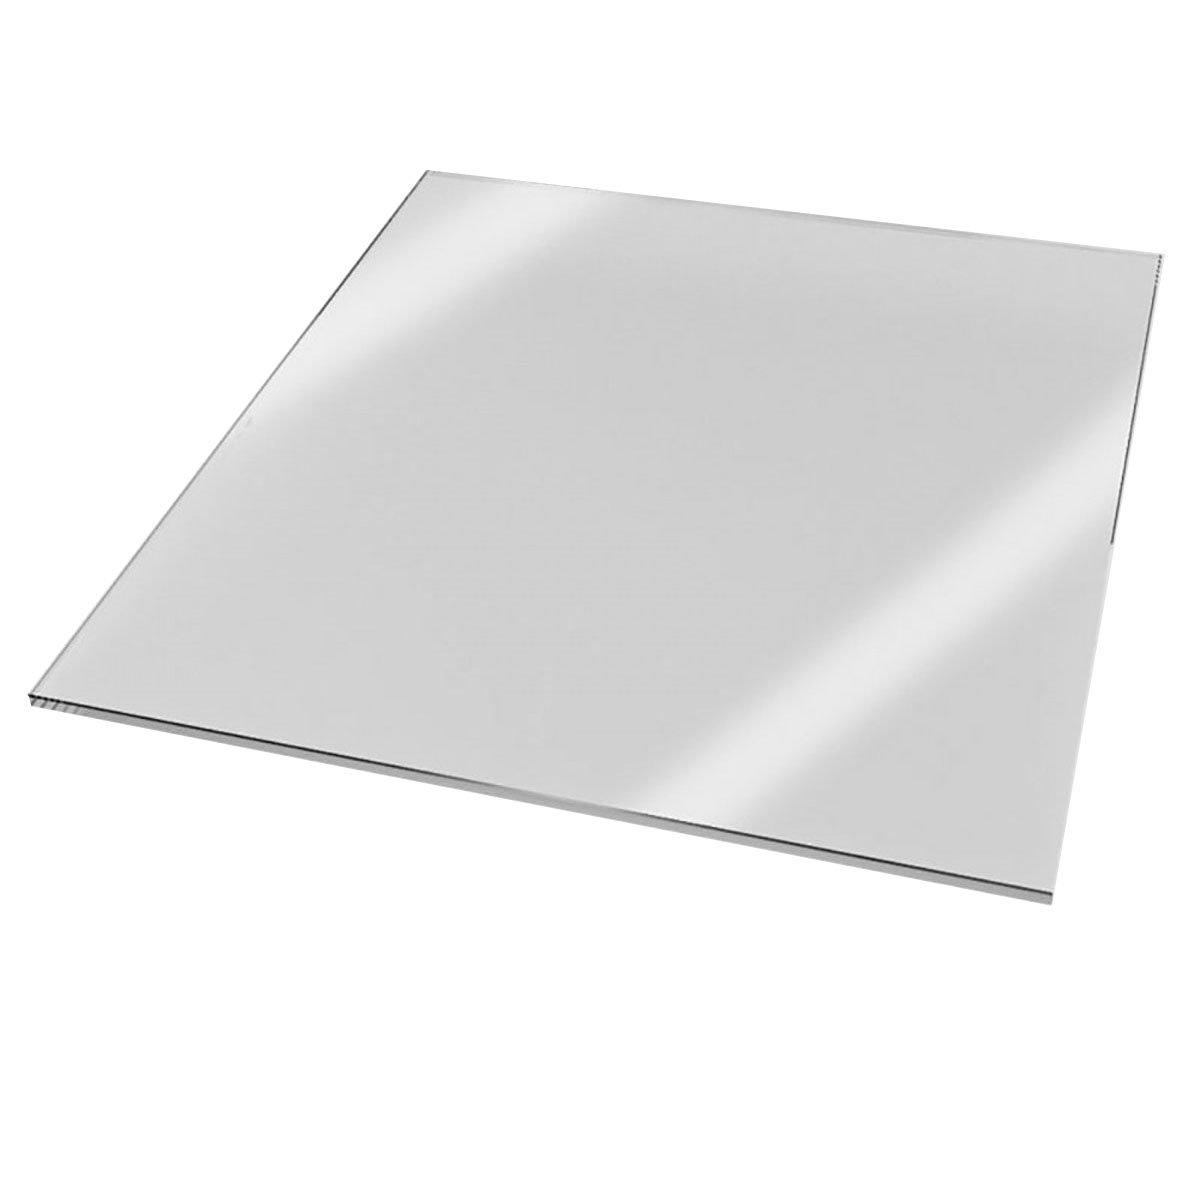 [Gulfcoast Robotics] Borosilicate Glass Print bed for RepRap 3D Printer Mendel or Prusa i3, 213x200mm. BG200